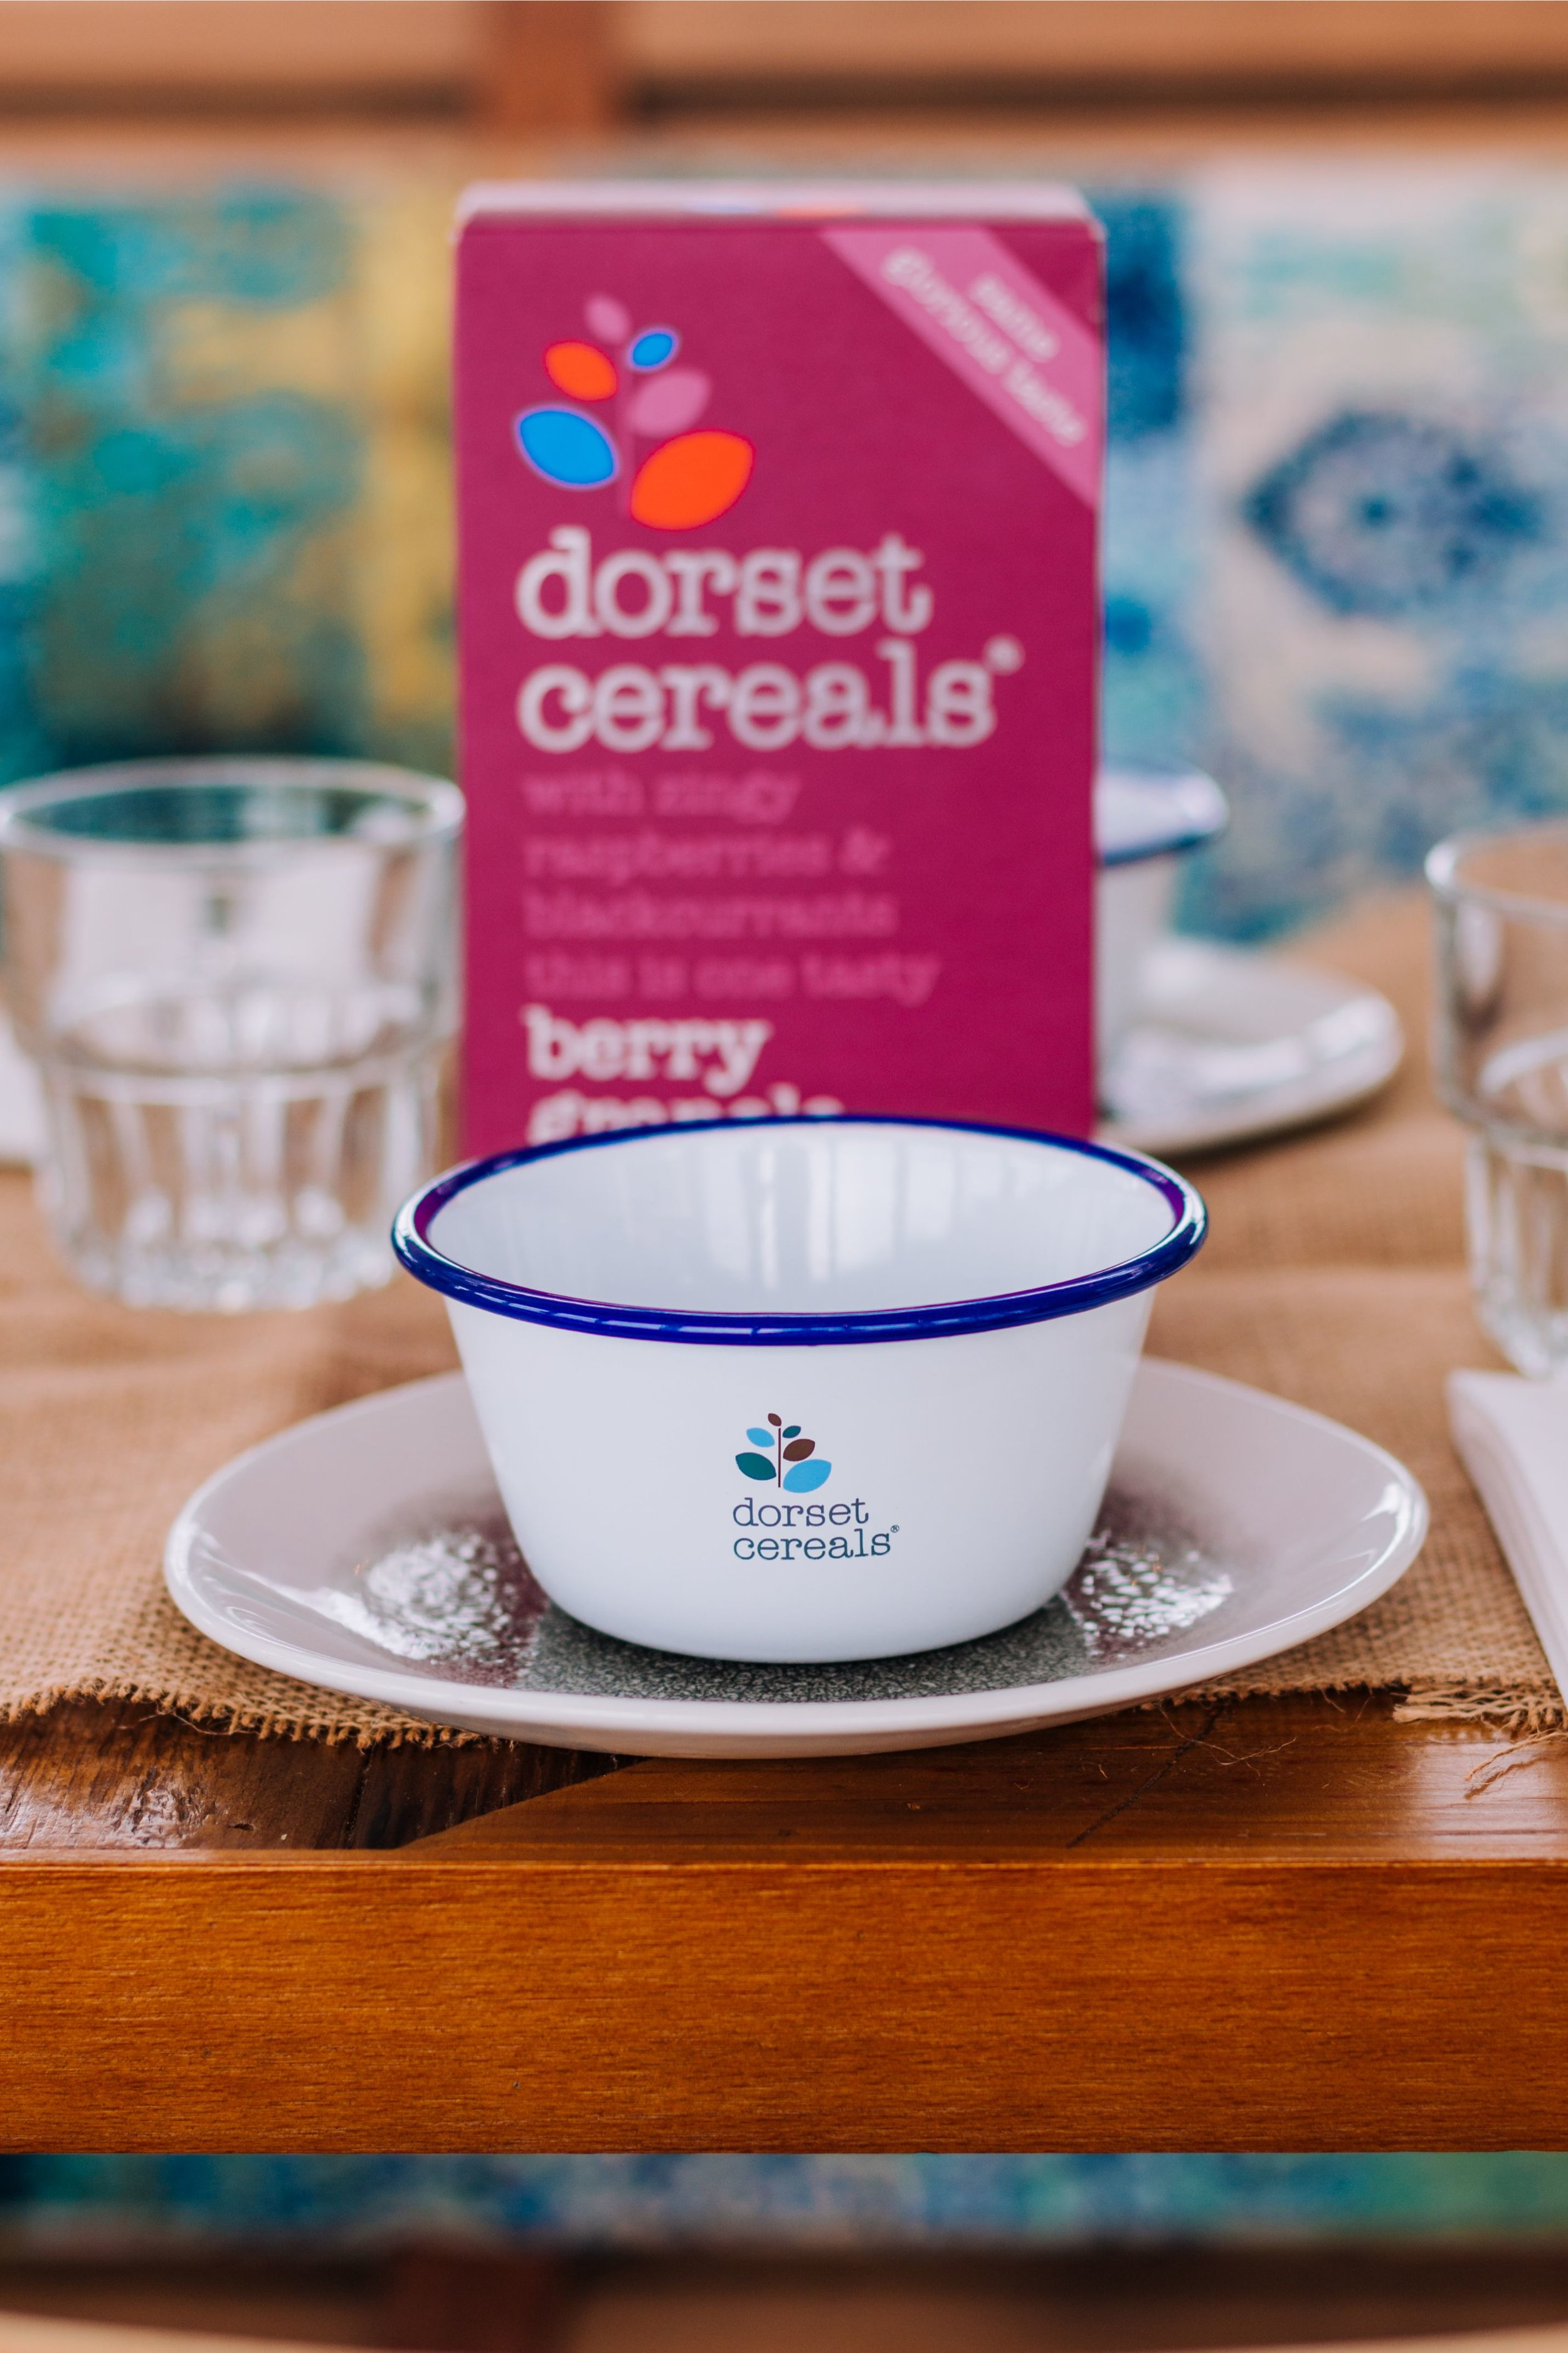 mums-the-word-dorset-cereals-brighton-45.jpg